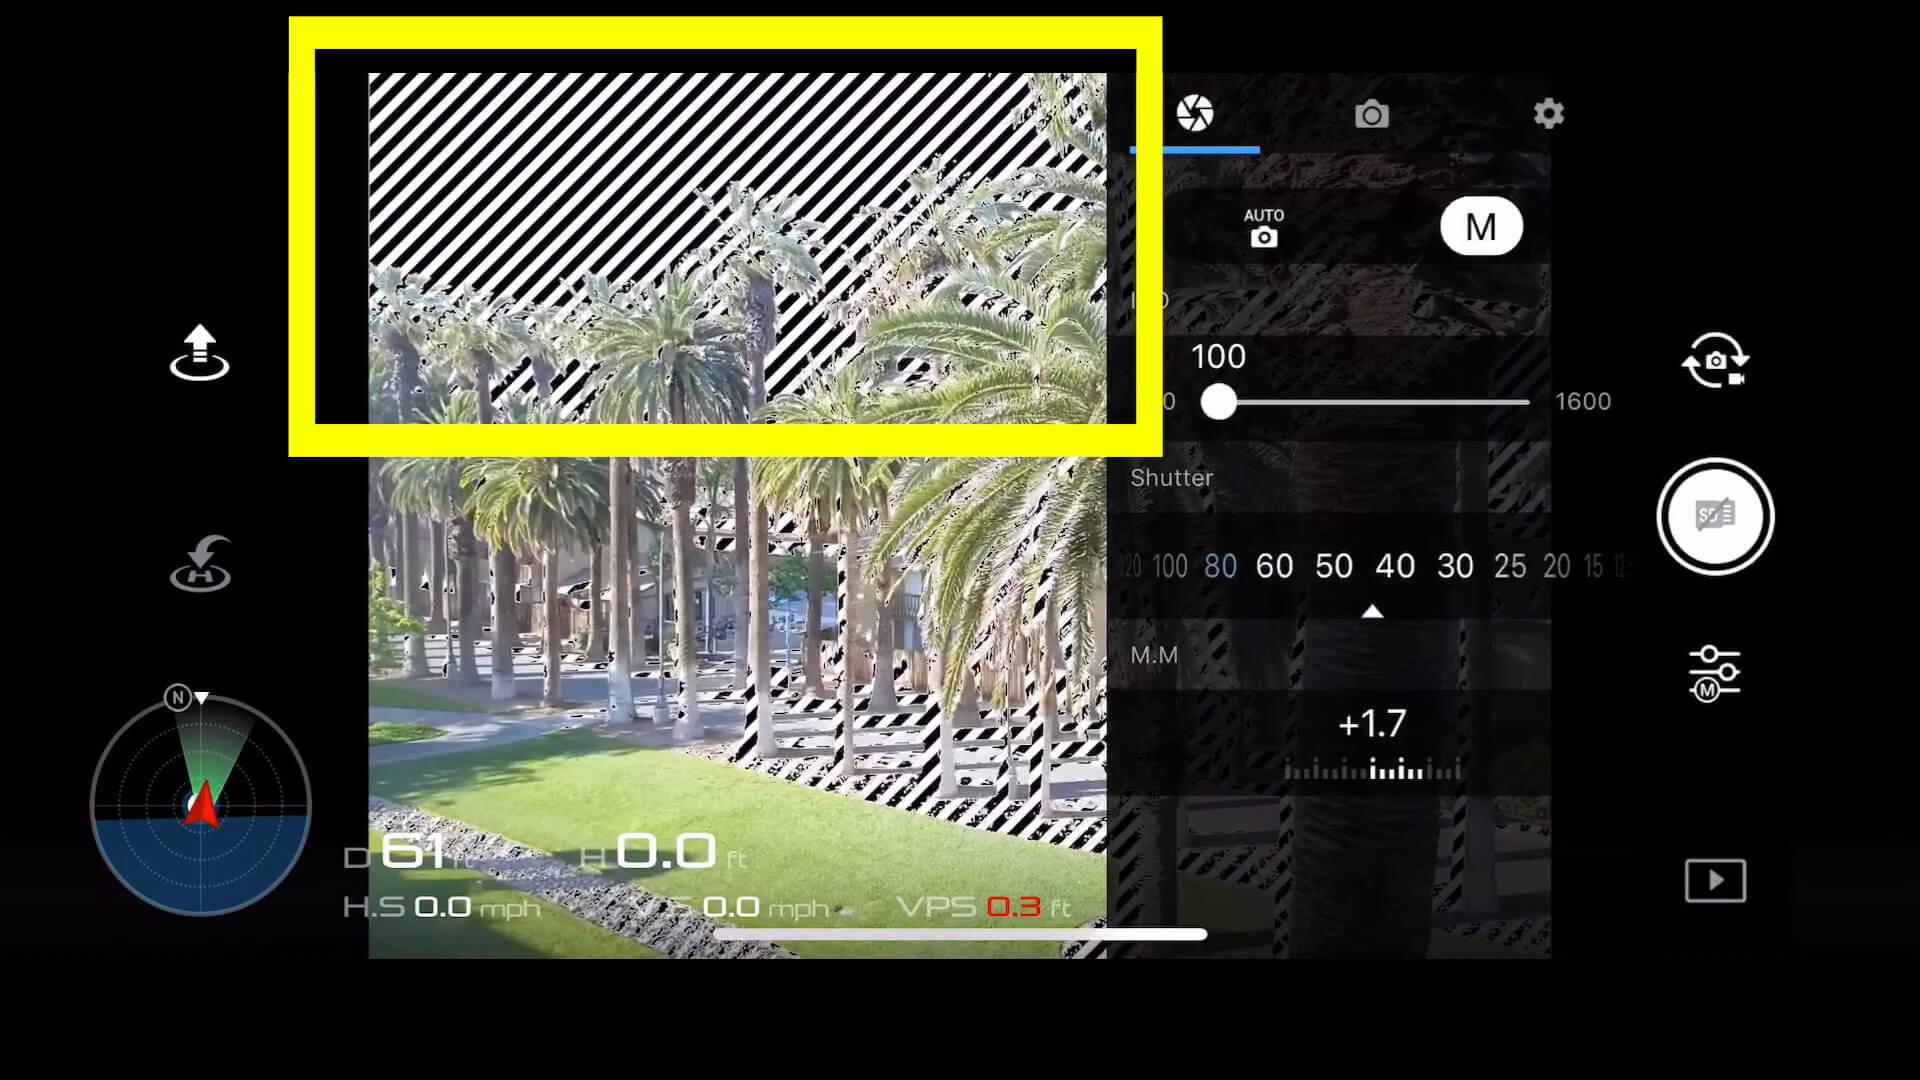 10 basic camera settings for dji drone photos - overexposure